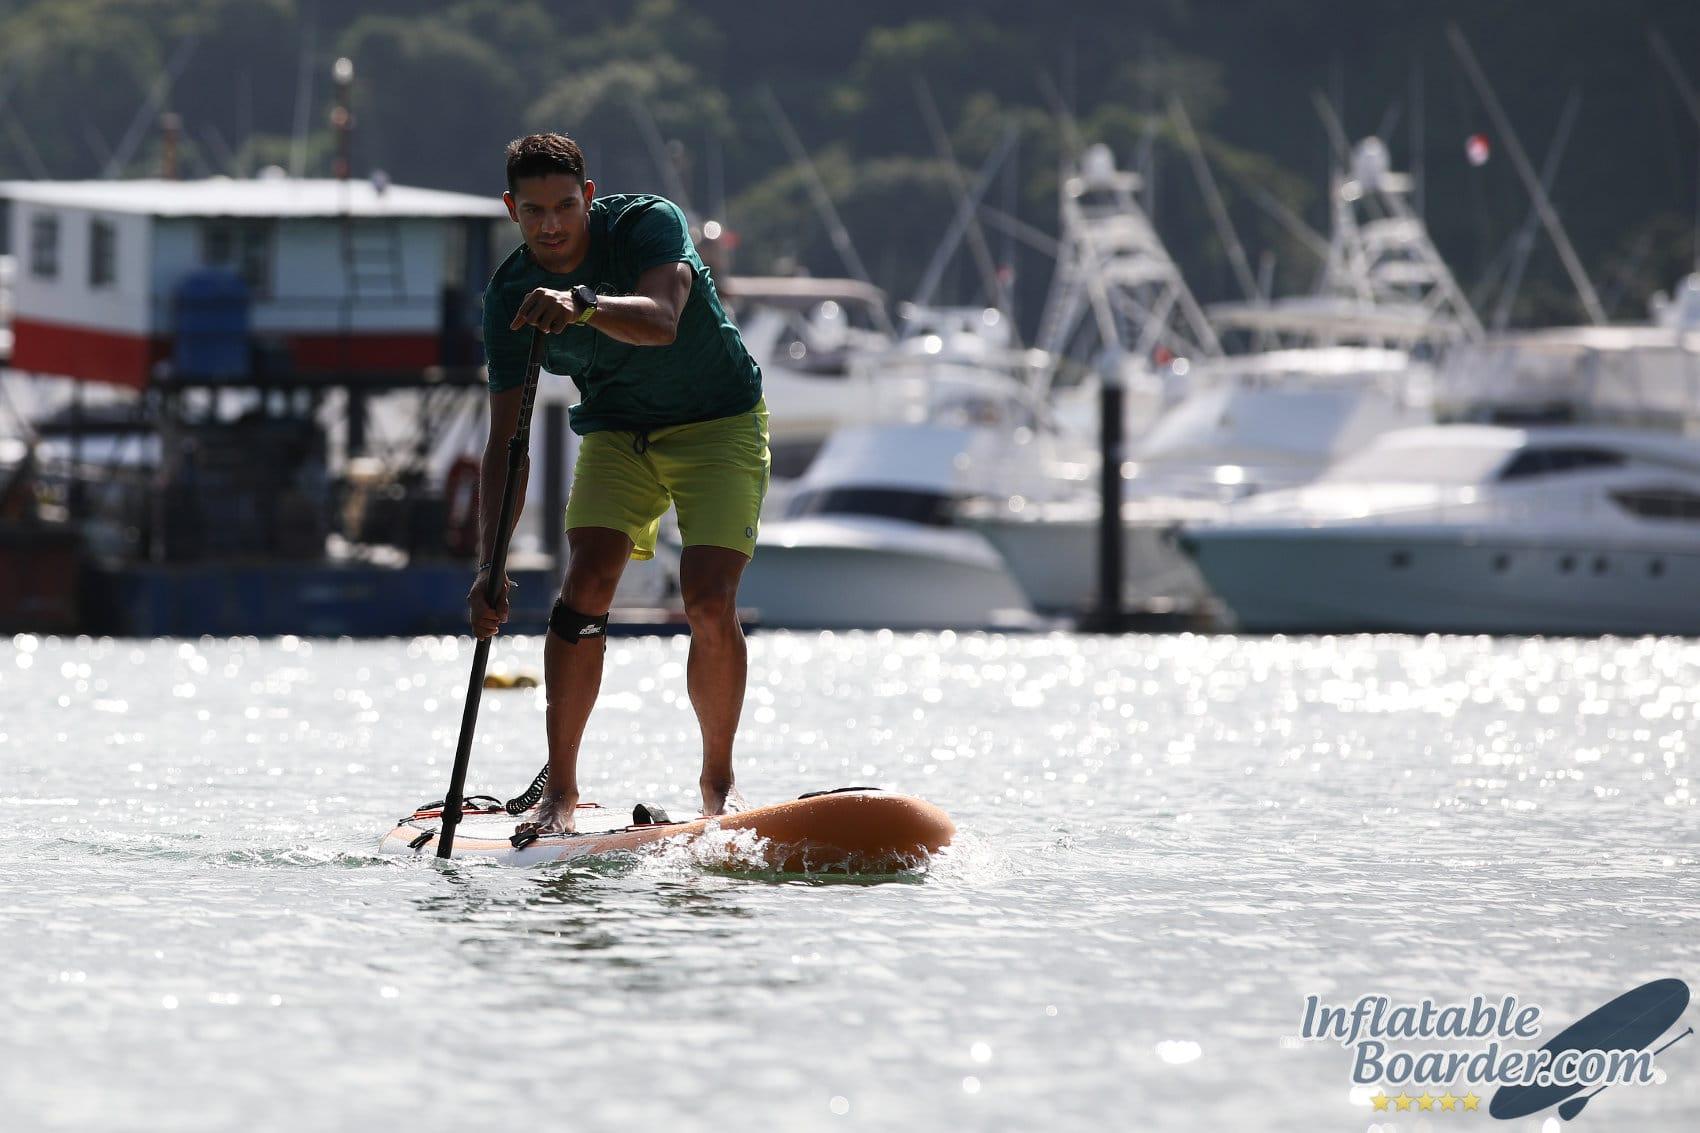 THURSO Waterwalker 120 Performance